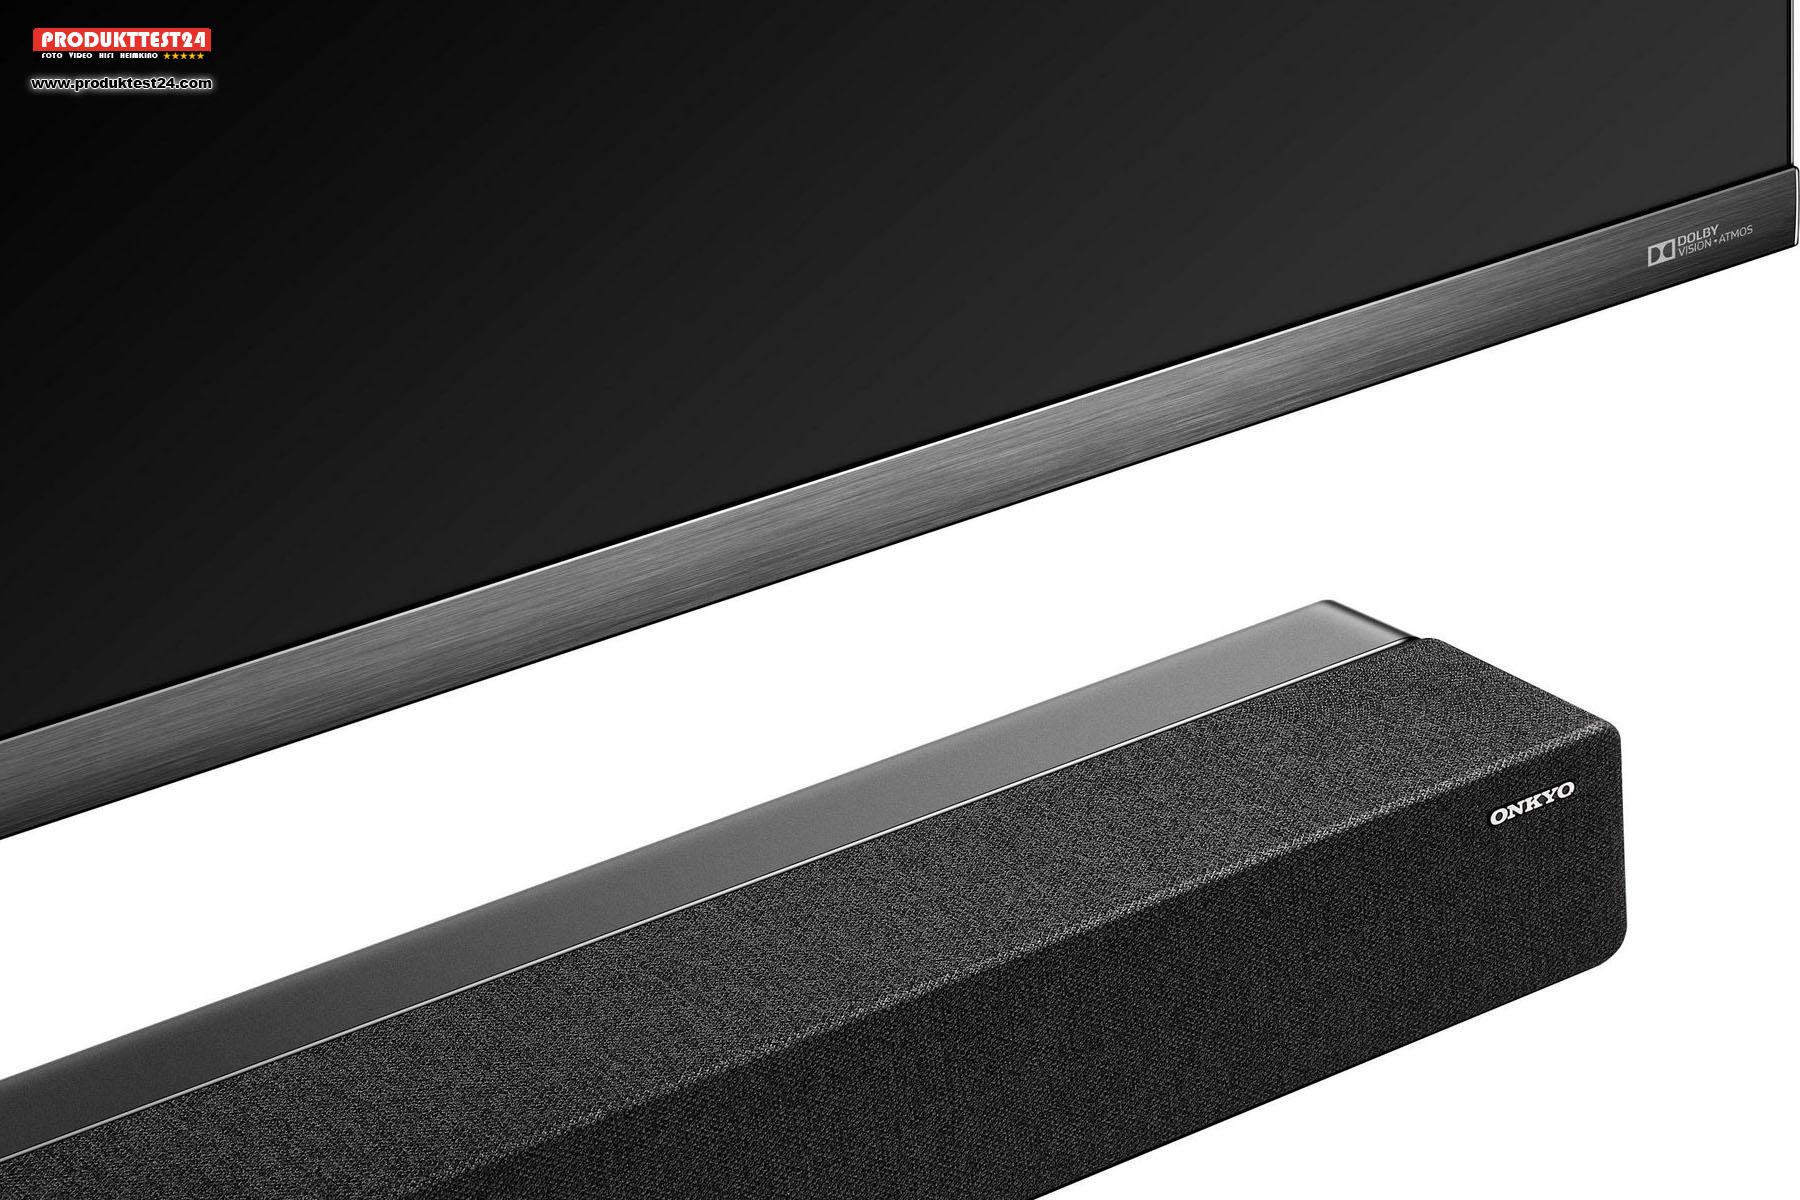 TCL 65X10 Mini-LED QLED 4K Fernseher mit integrierter ONKYO Soundbar